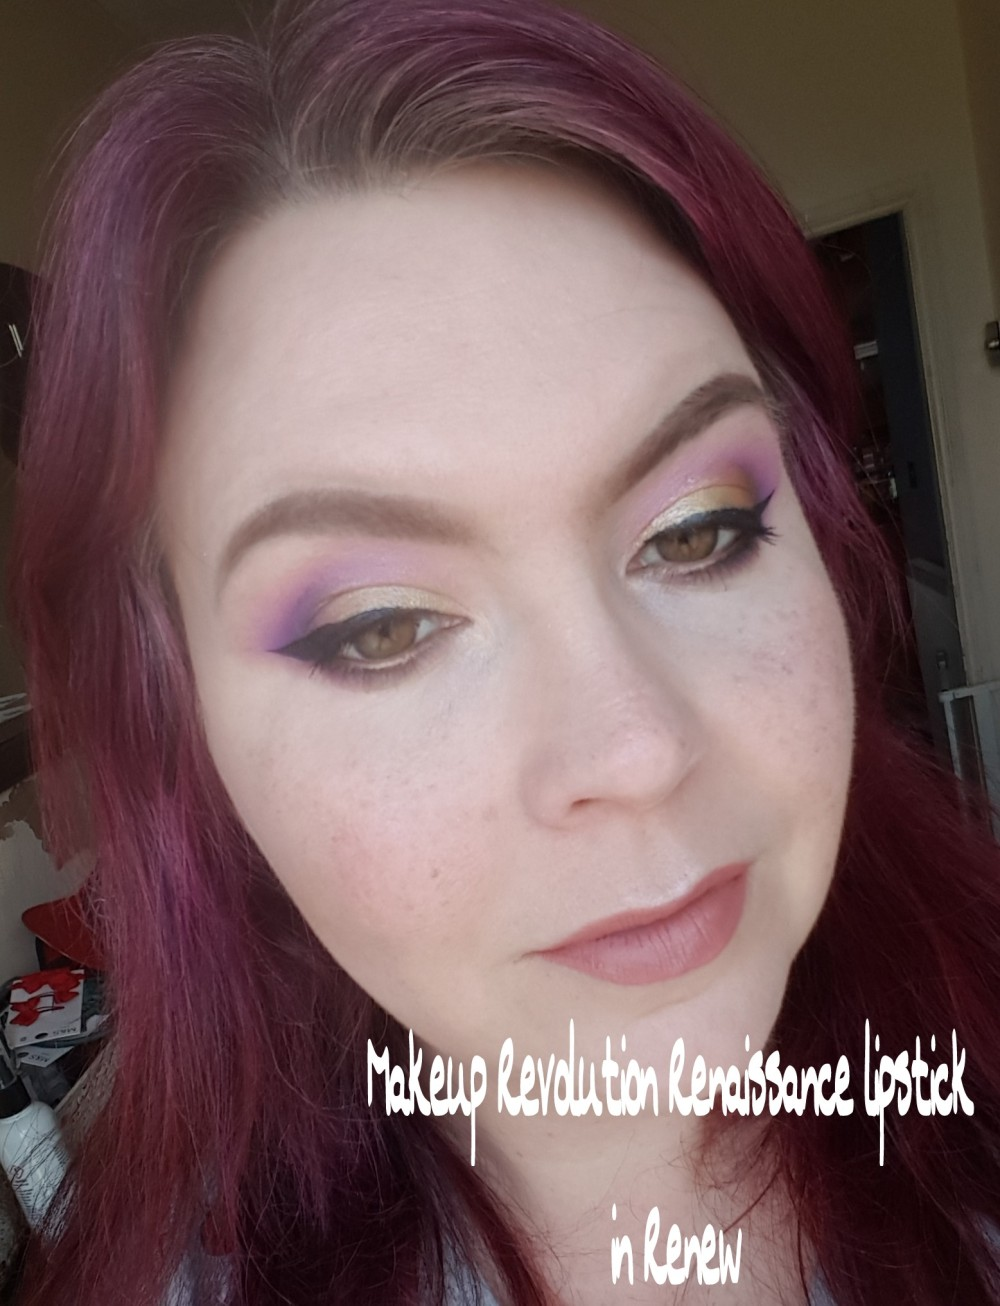 Revolution renaissance lipstick Renew